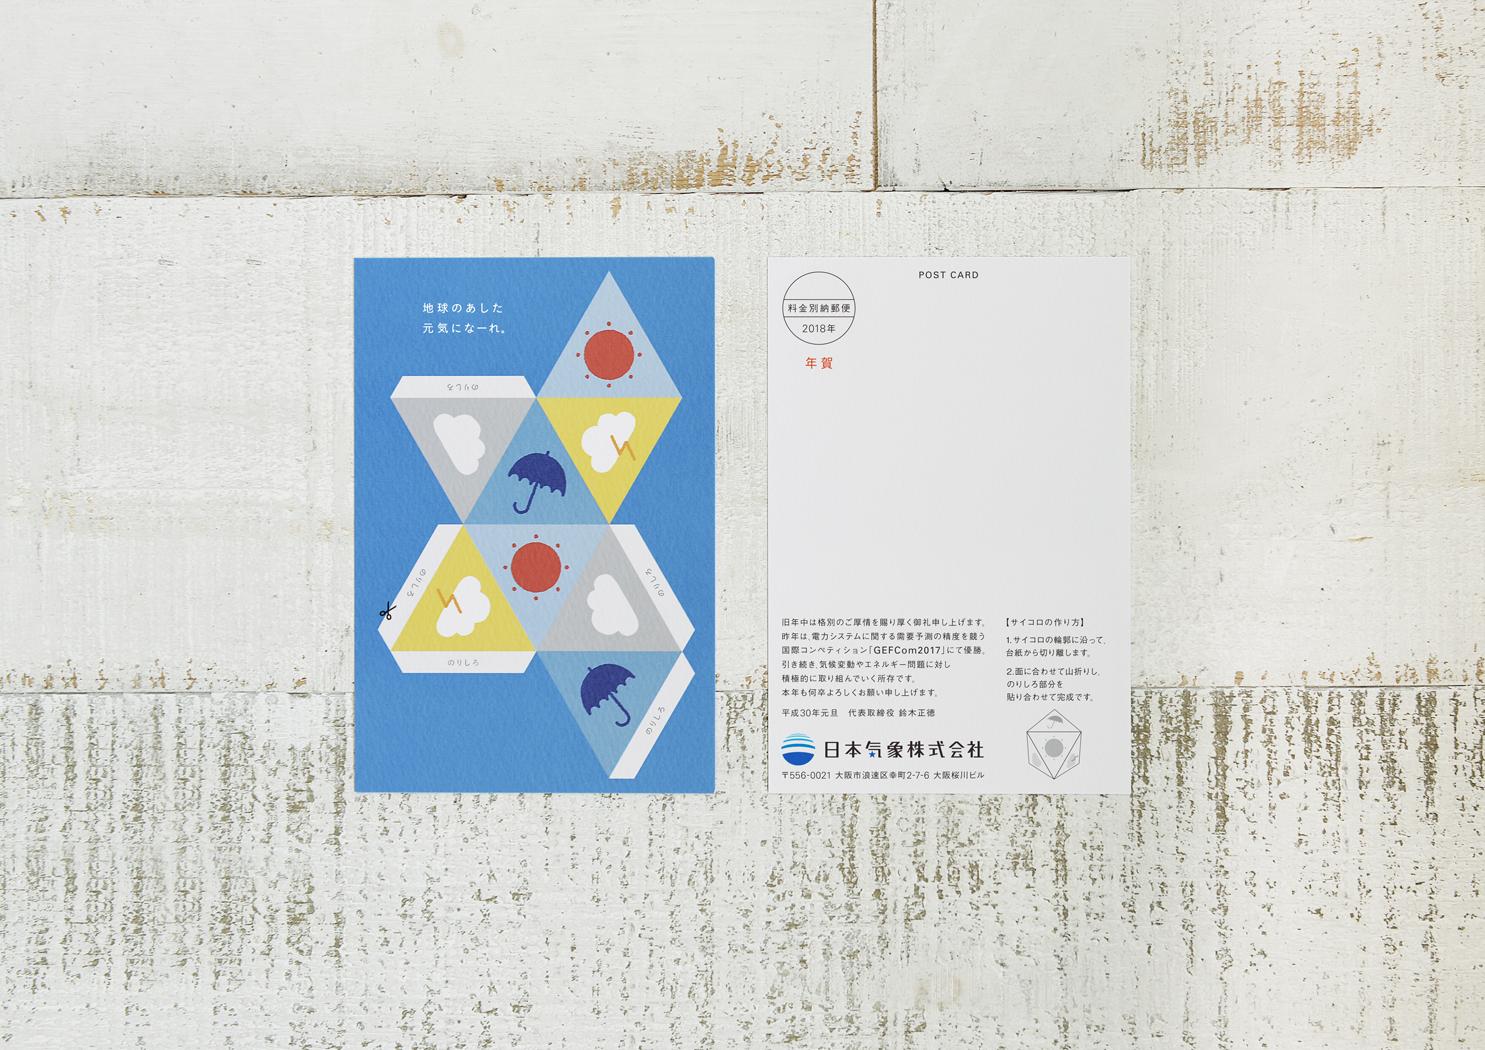 Nihonkisho New Year's Card 2018